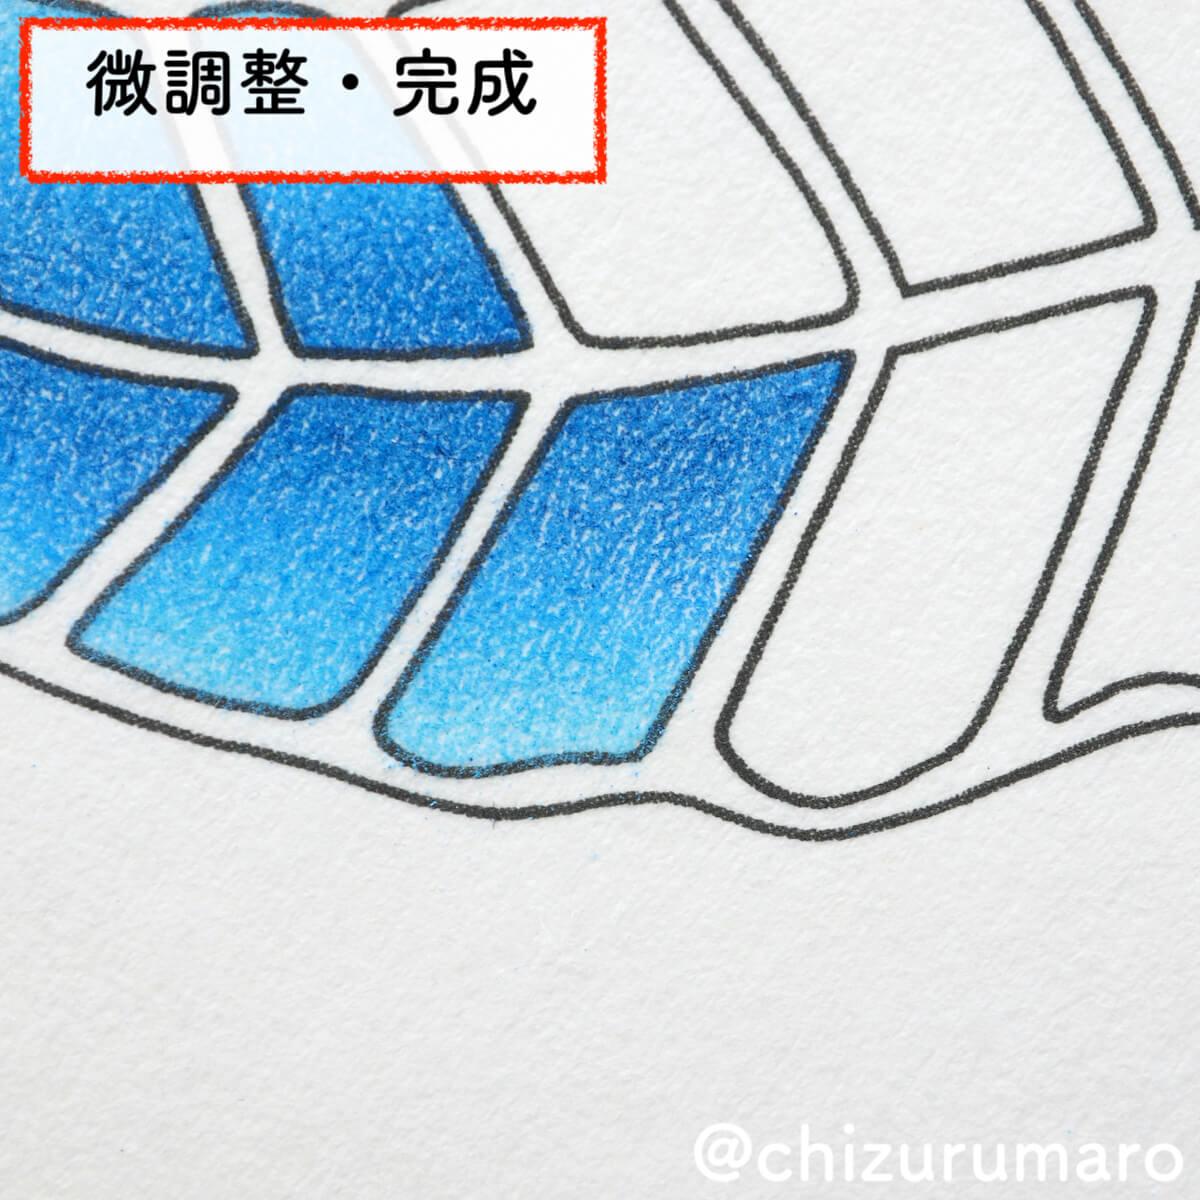 f:id:chizurumaro:20200616114411j:plain